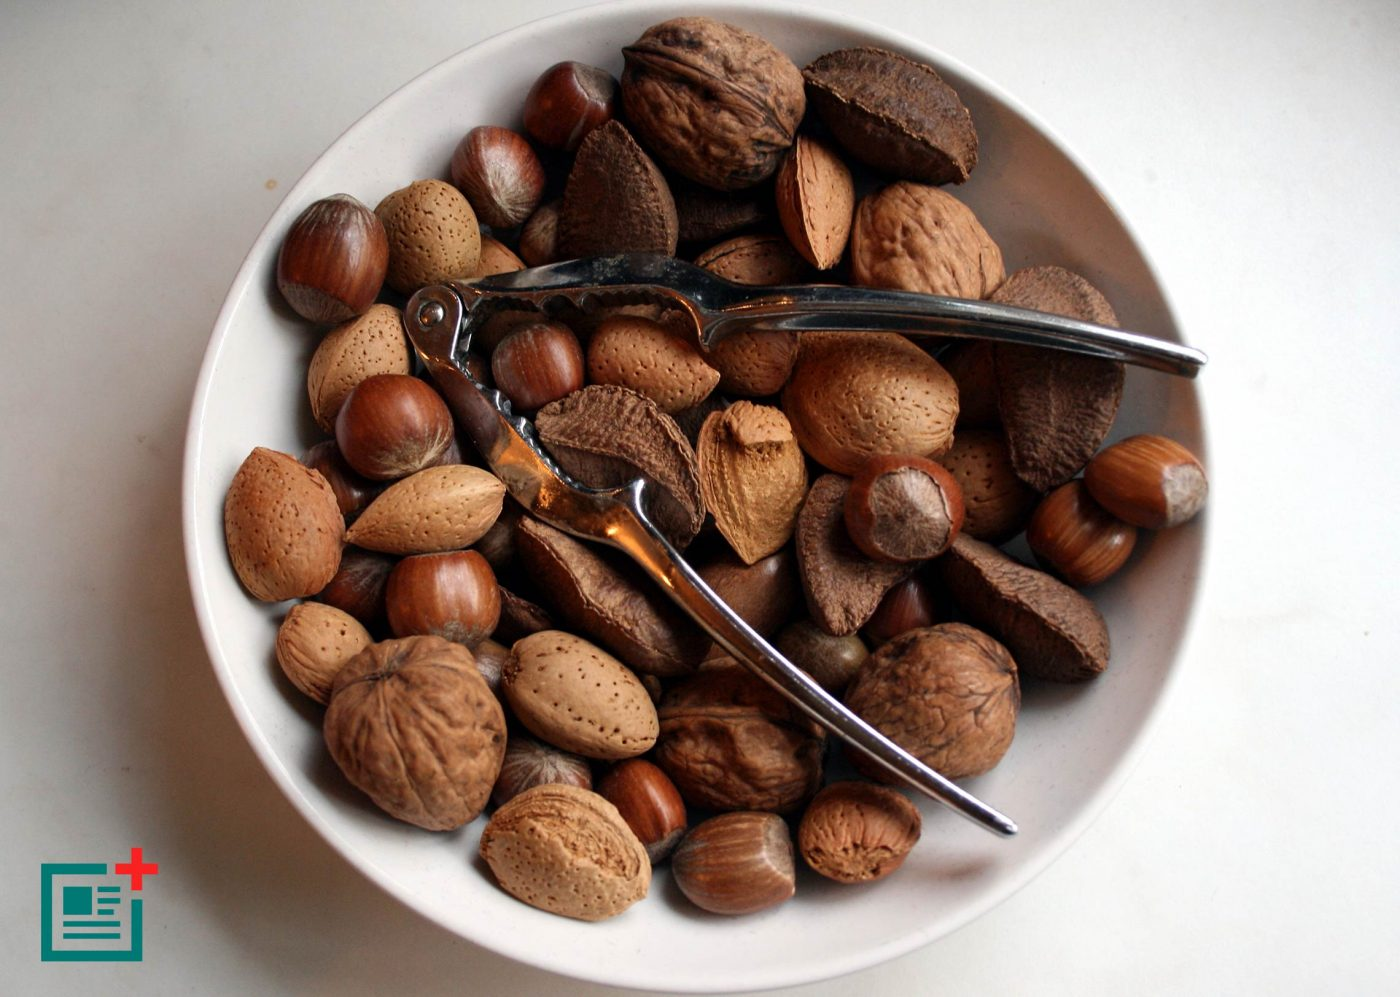 healthiest food